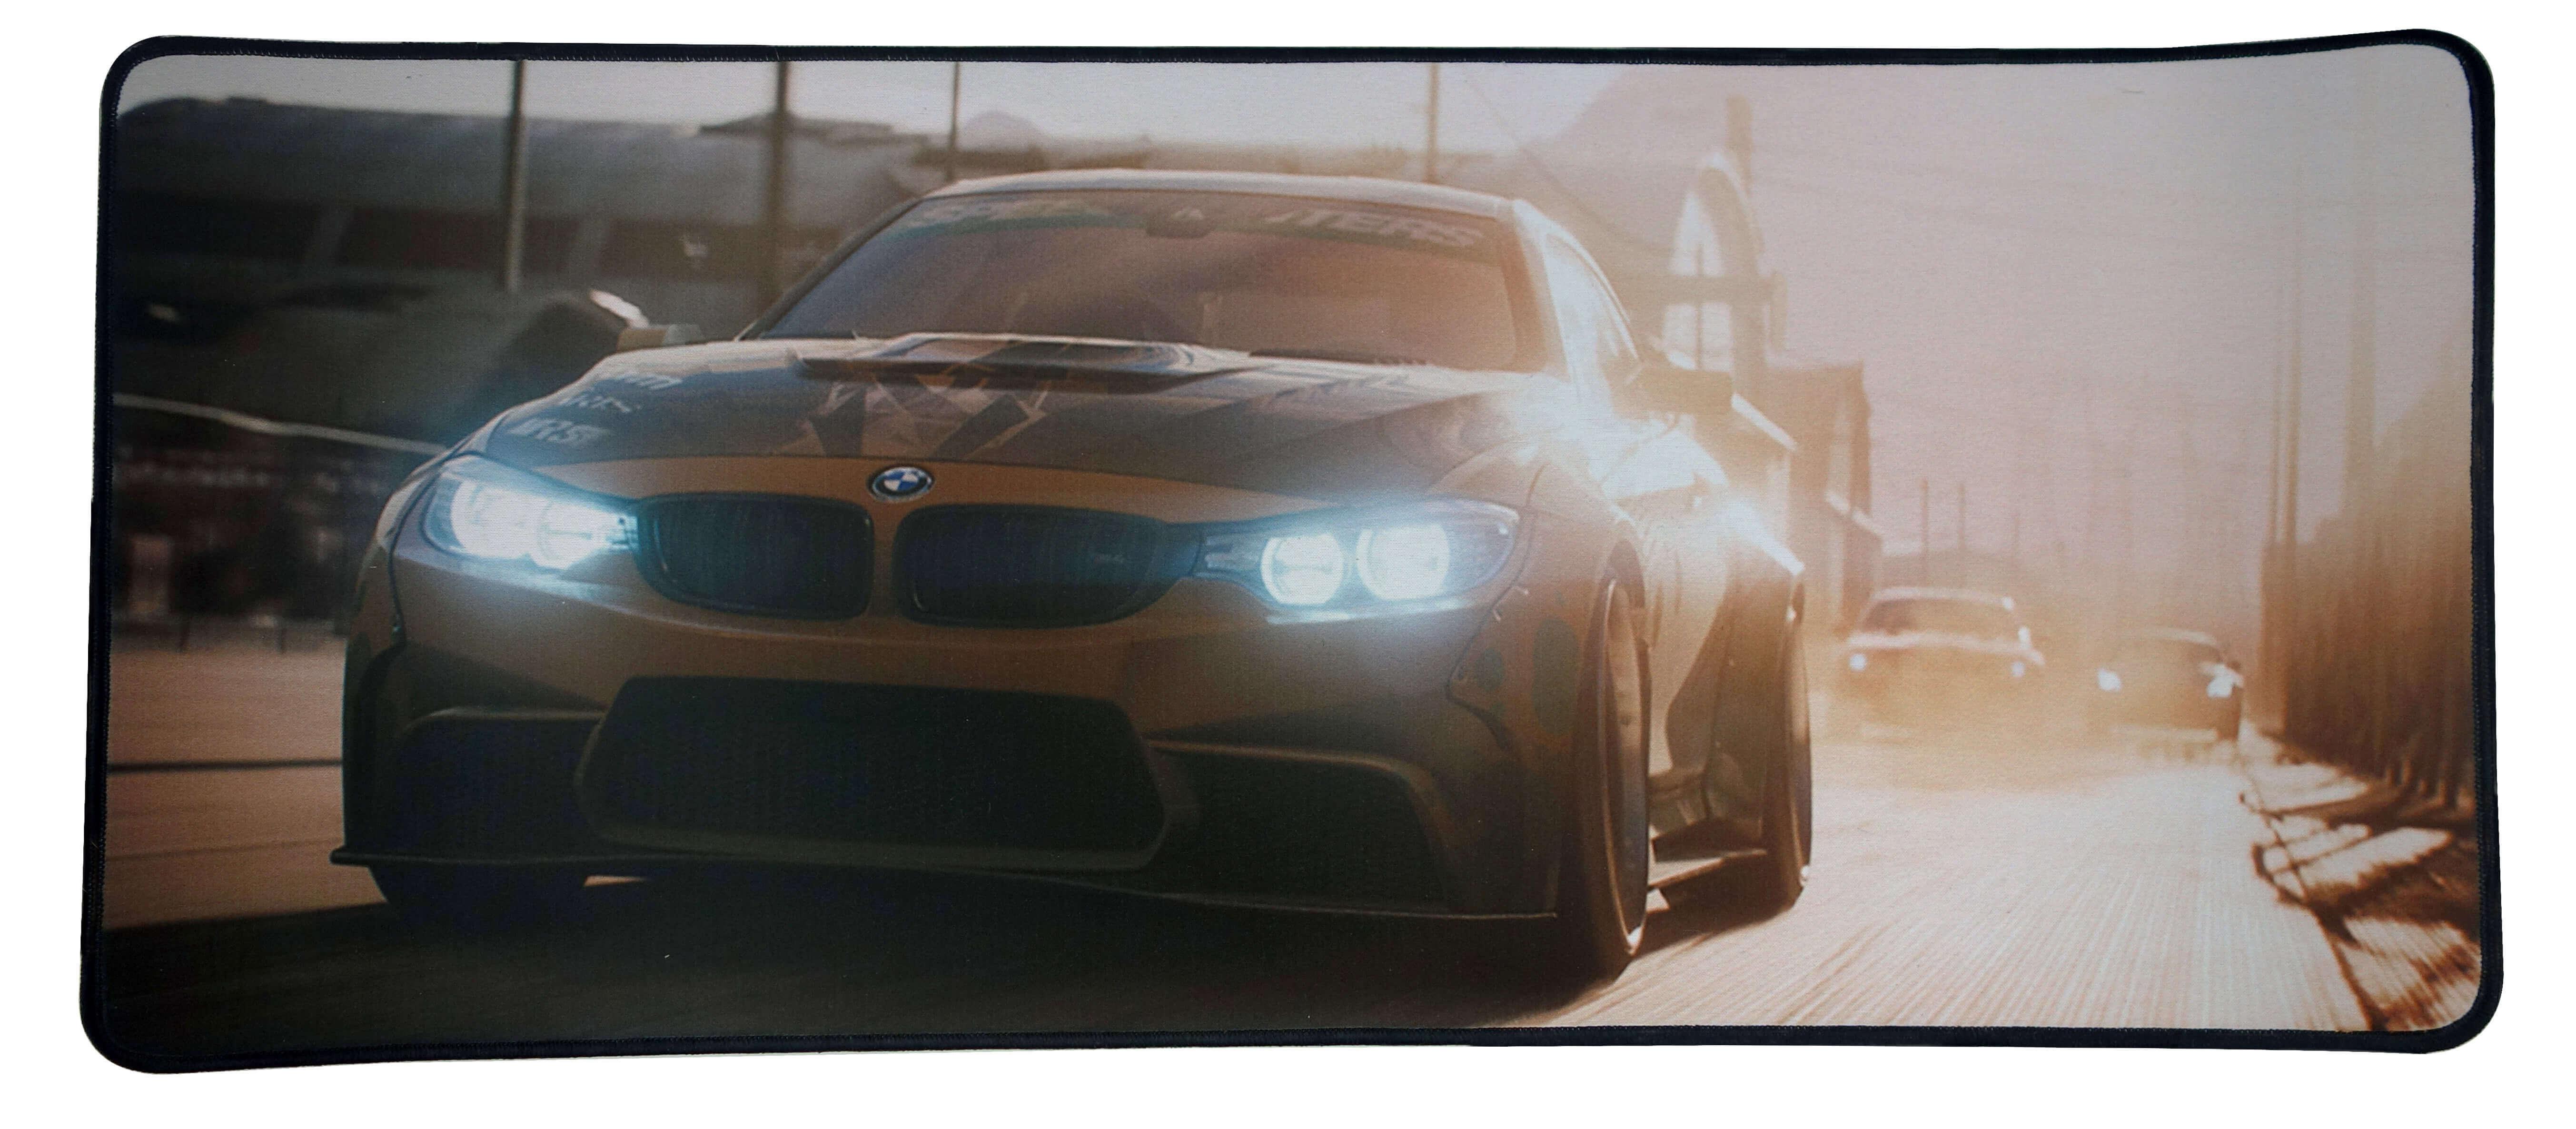 Геймърска подложка за мишка NFS BMW XL